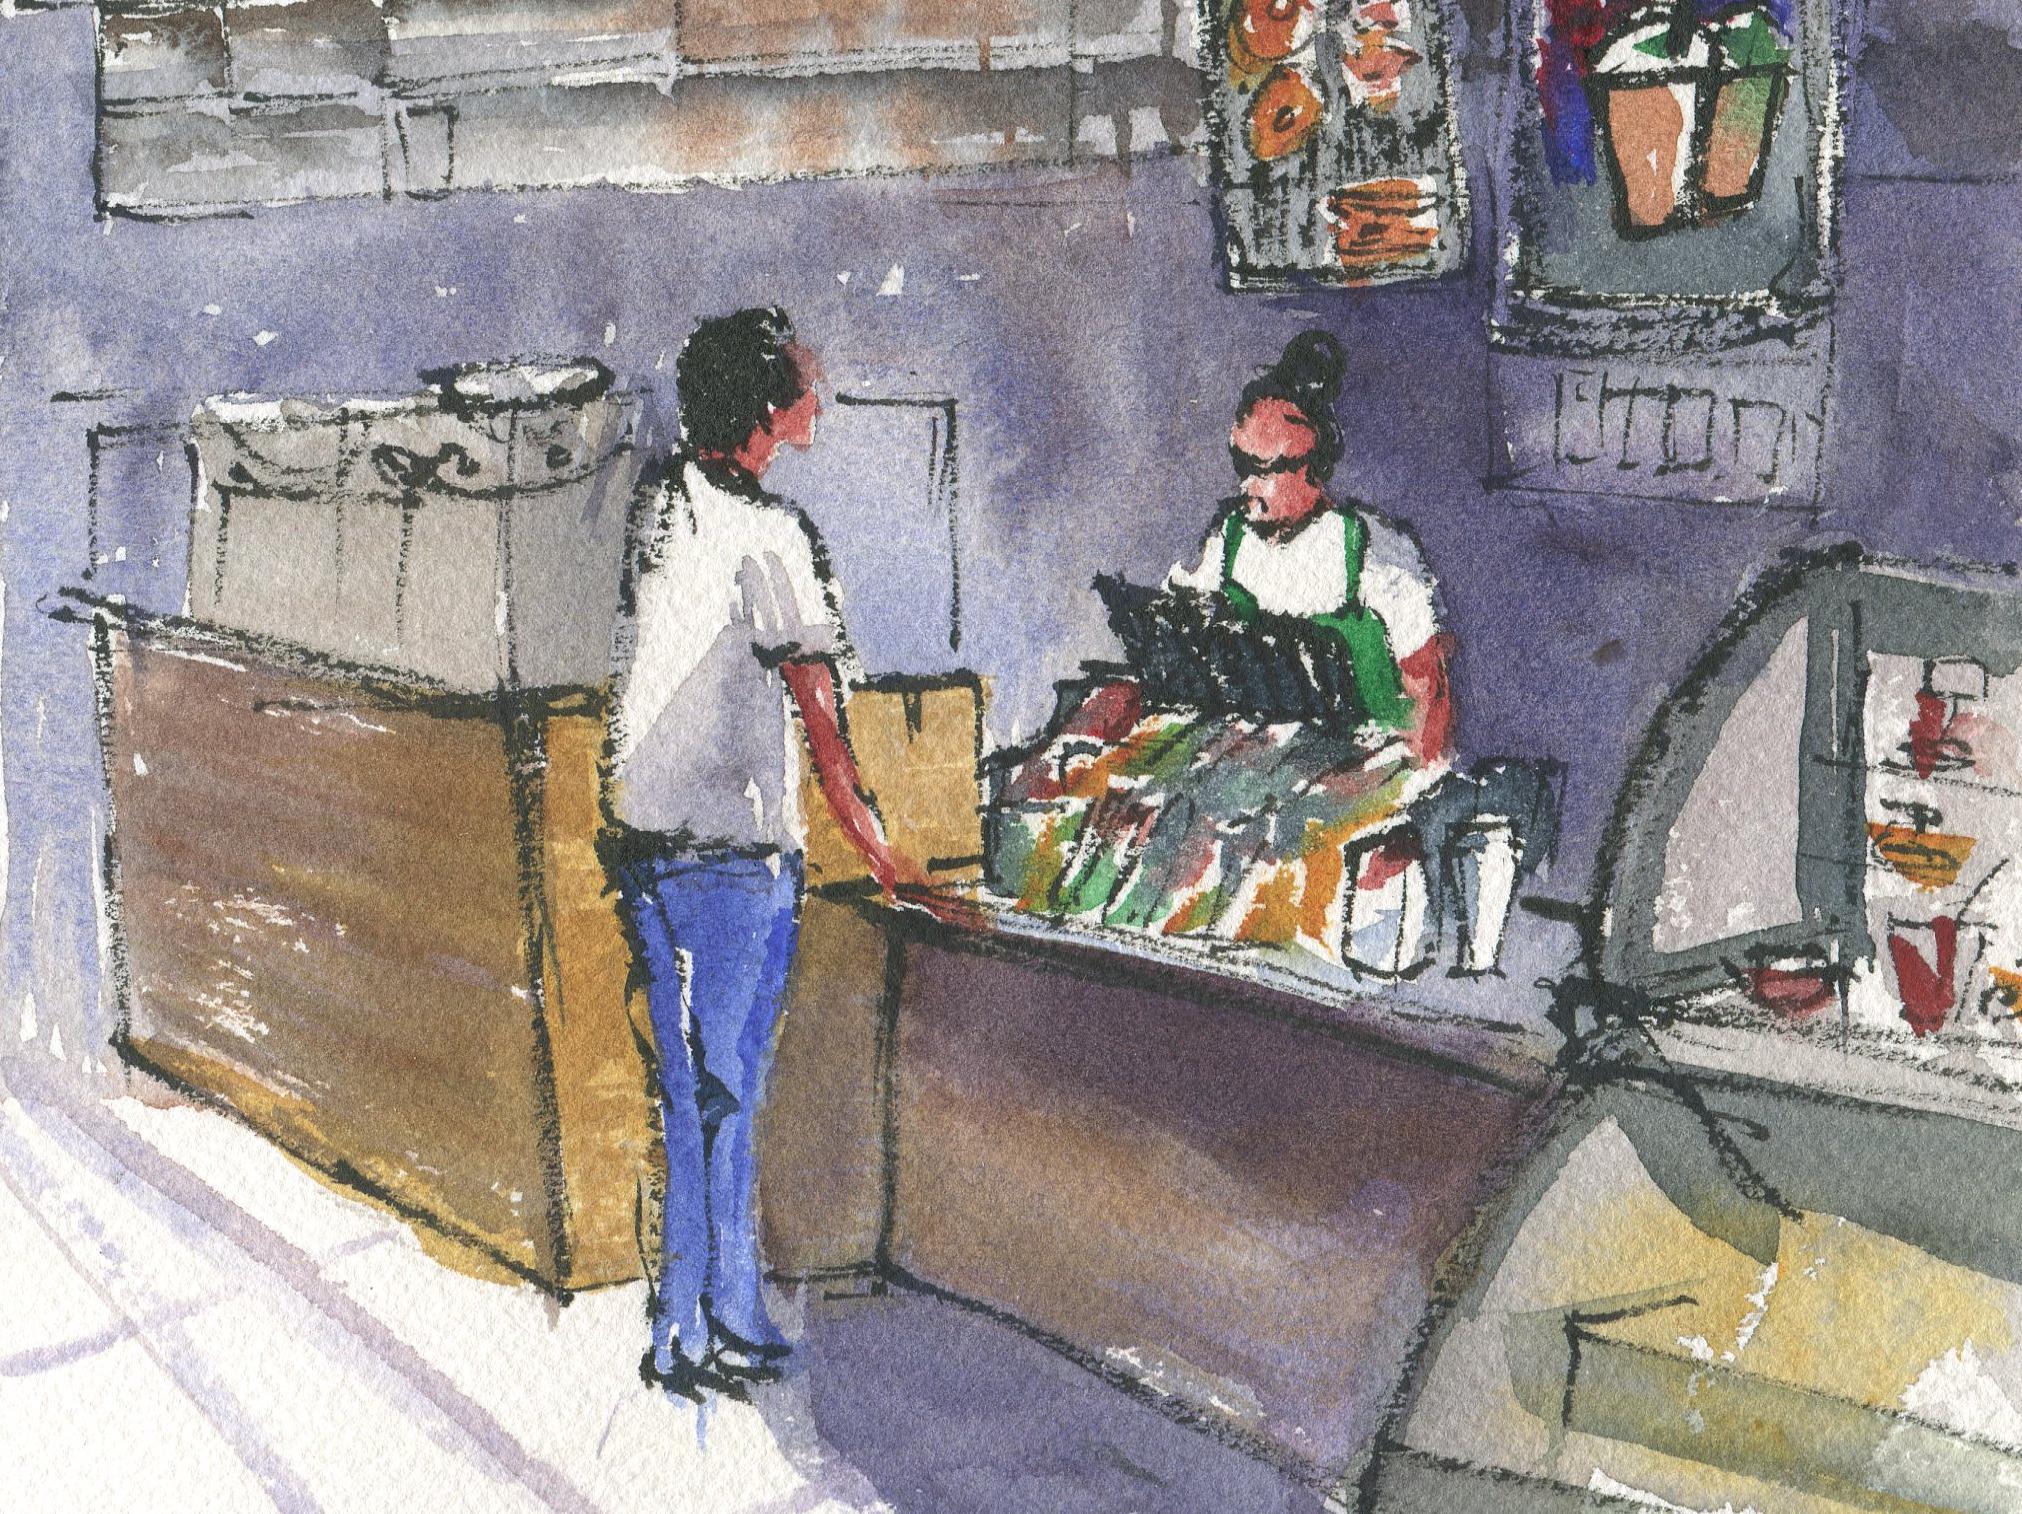 starbucks urbans ketching in watercolor